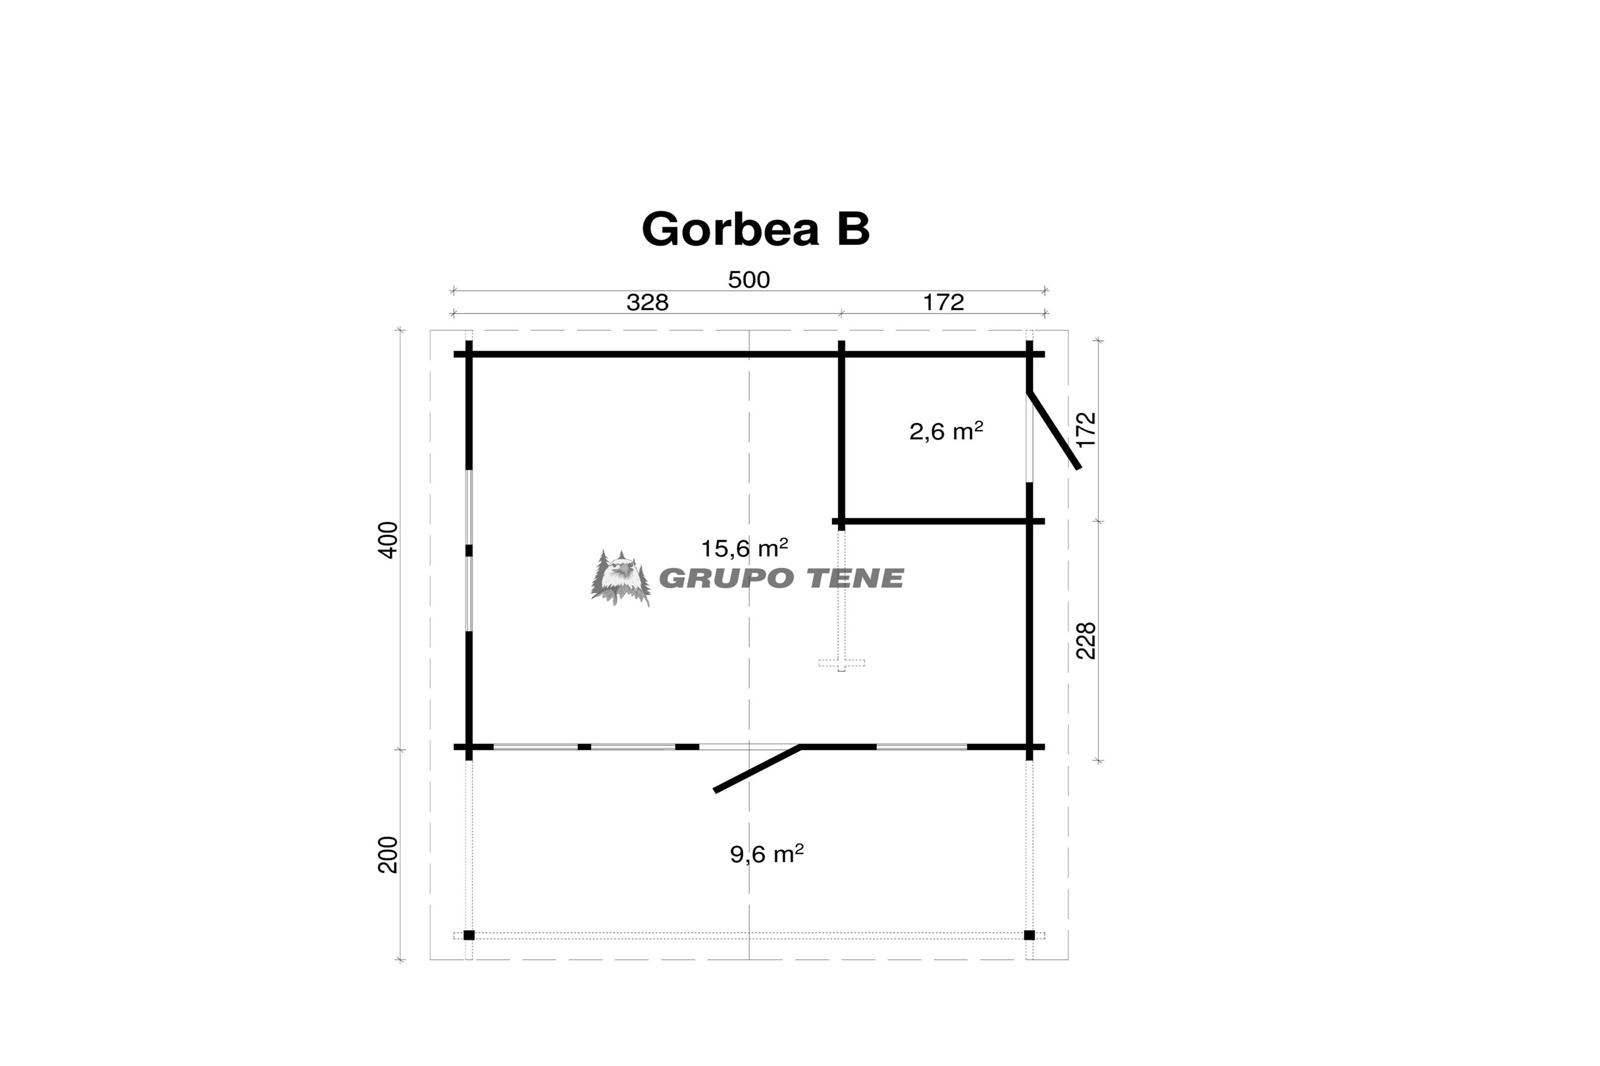 plano gorbea b